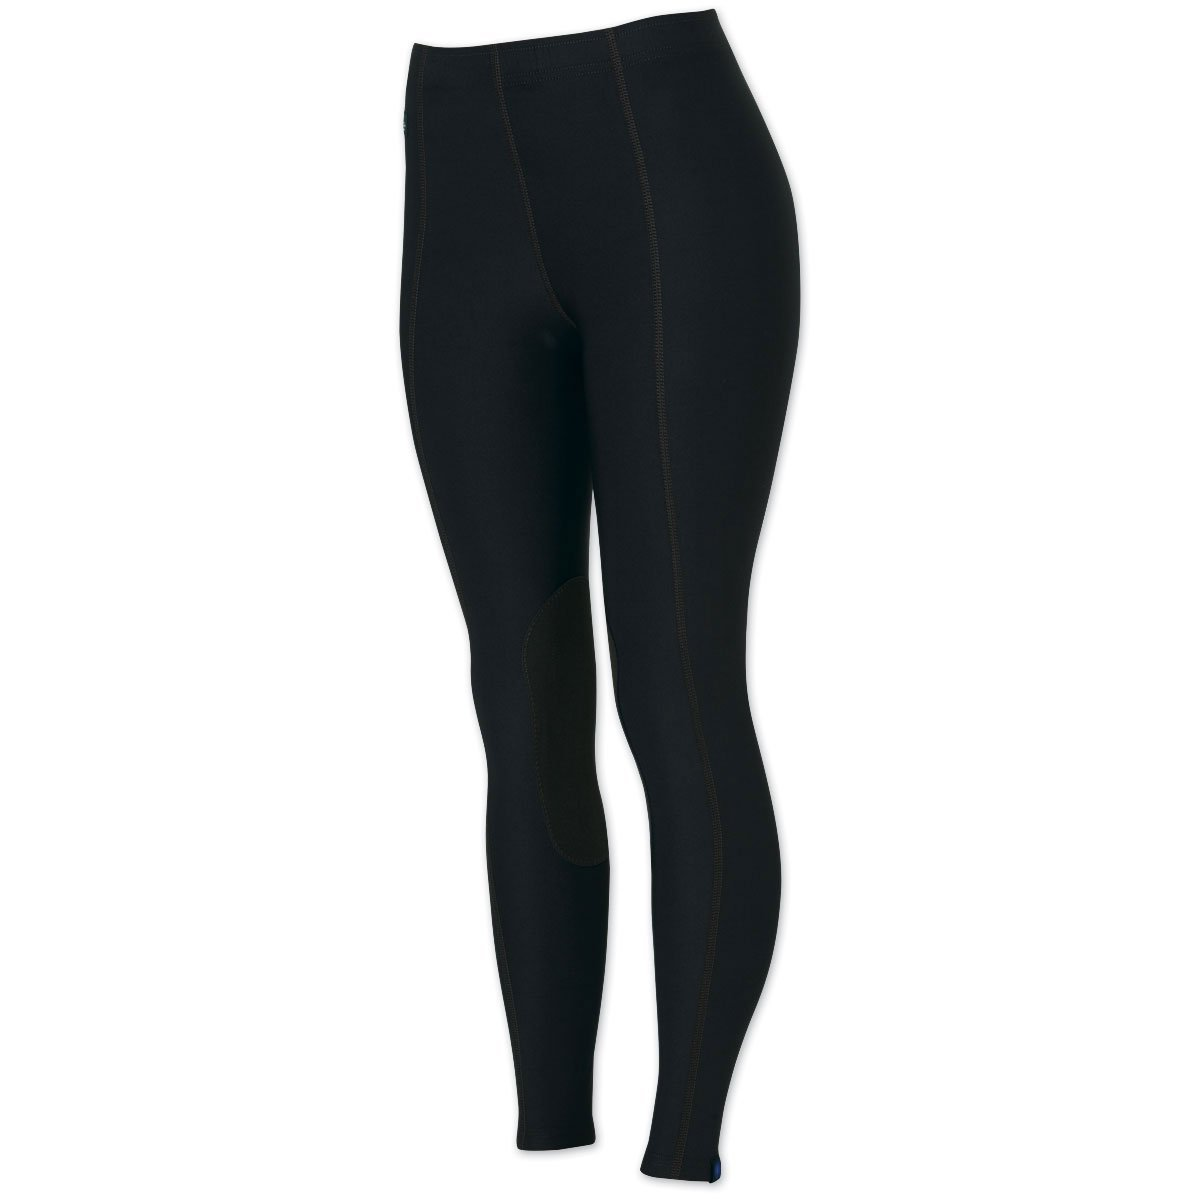 Irideon Ladies Issential Tights XLarge Black